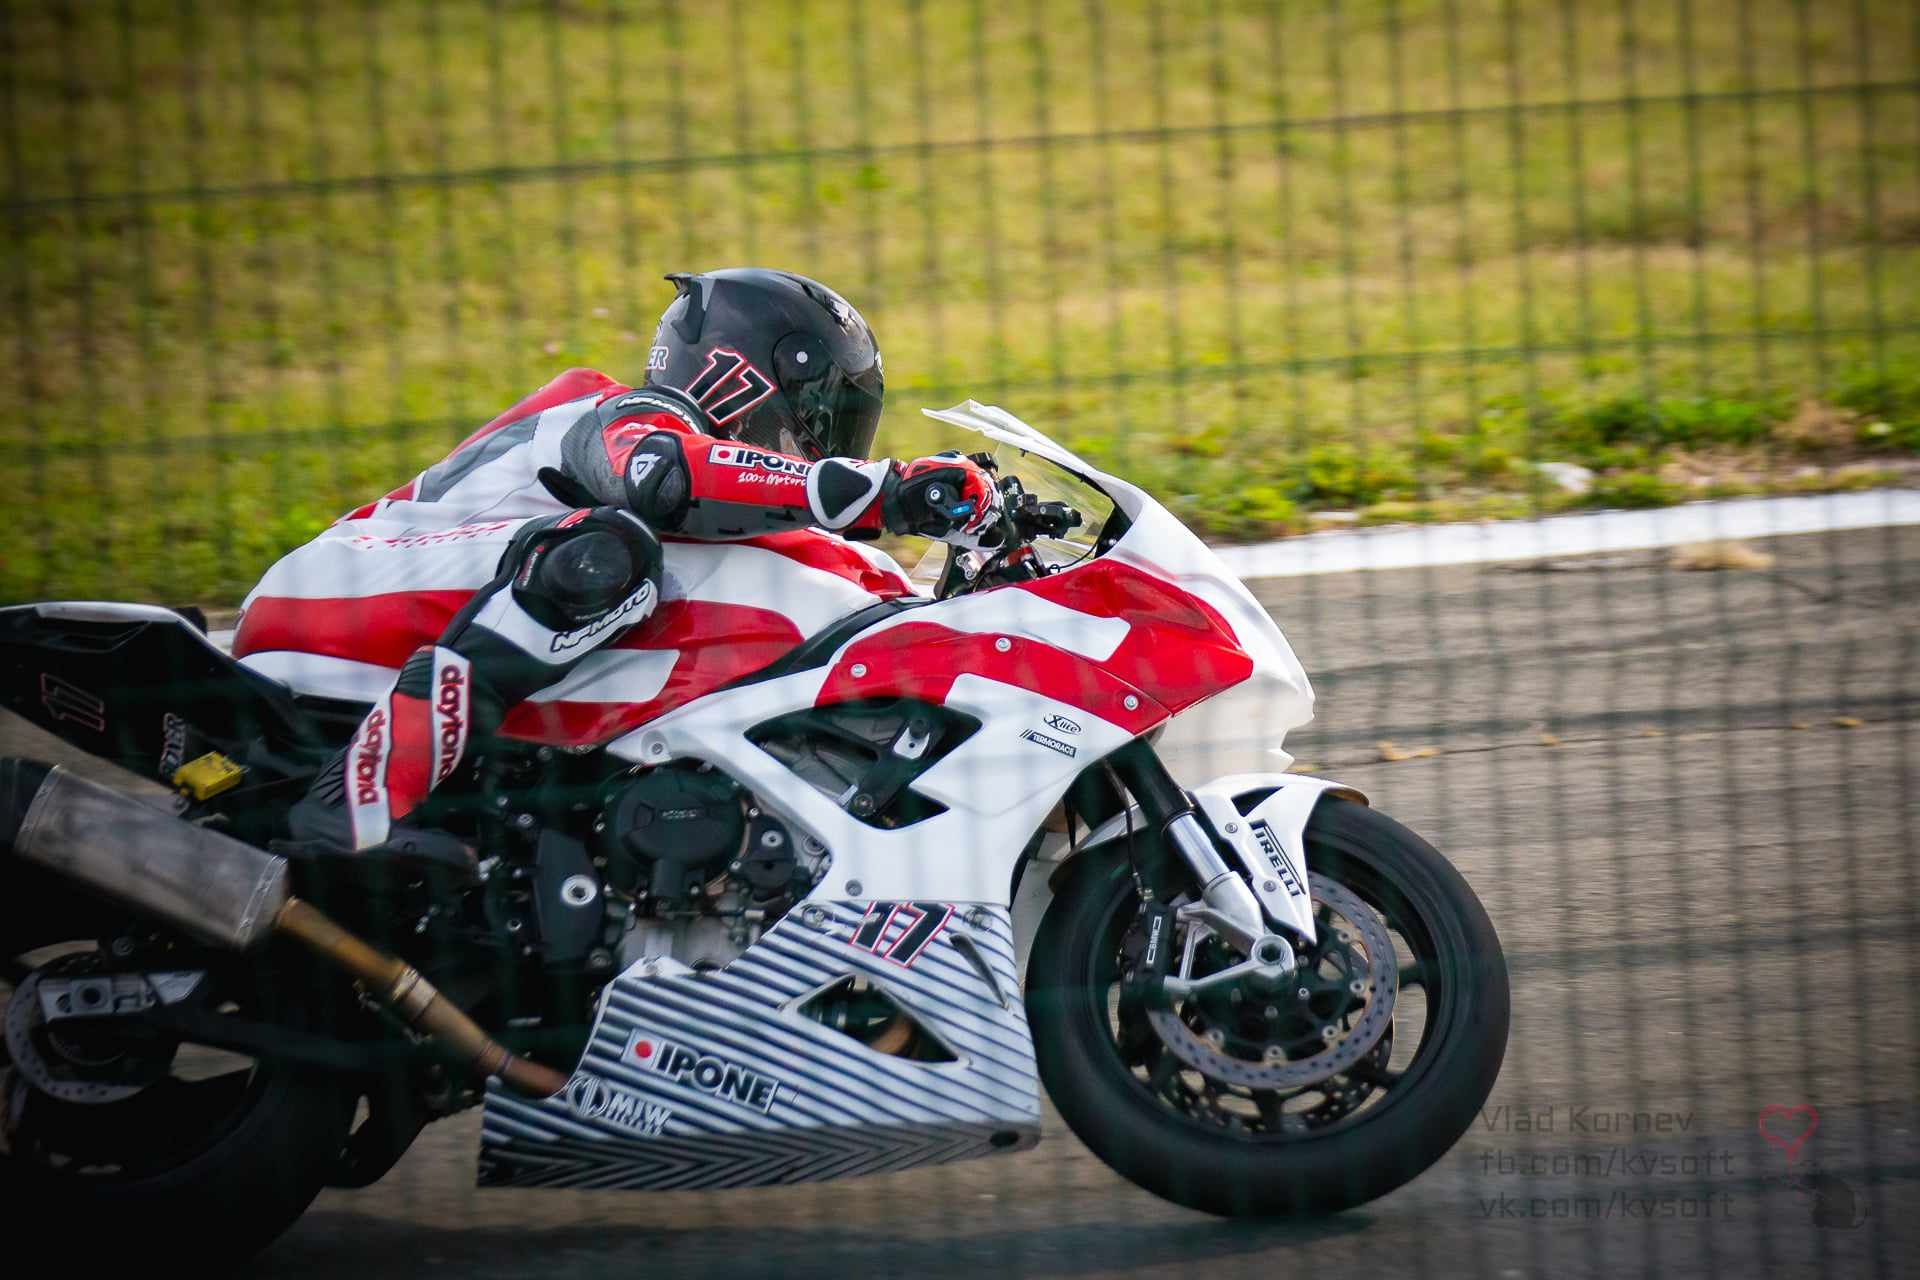 5-6_etap_MotoGPUkraine_152